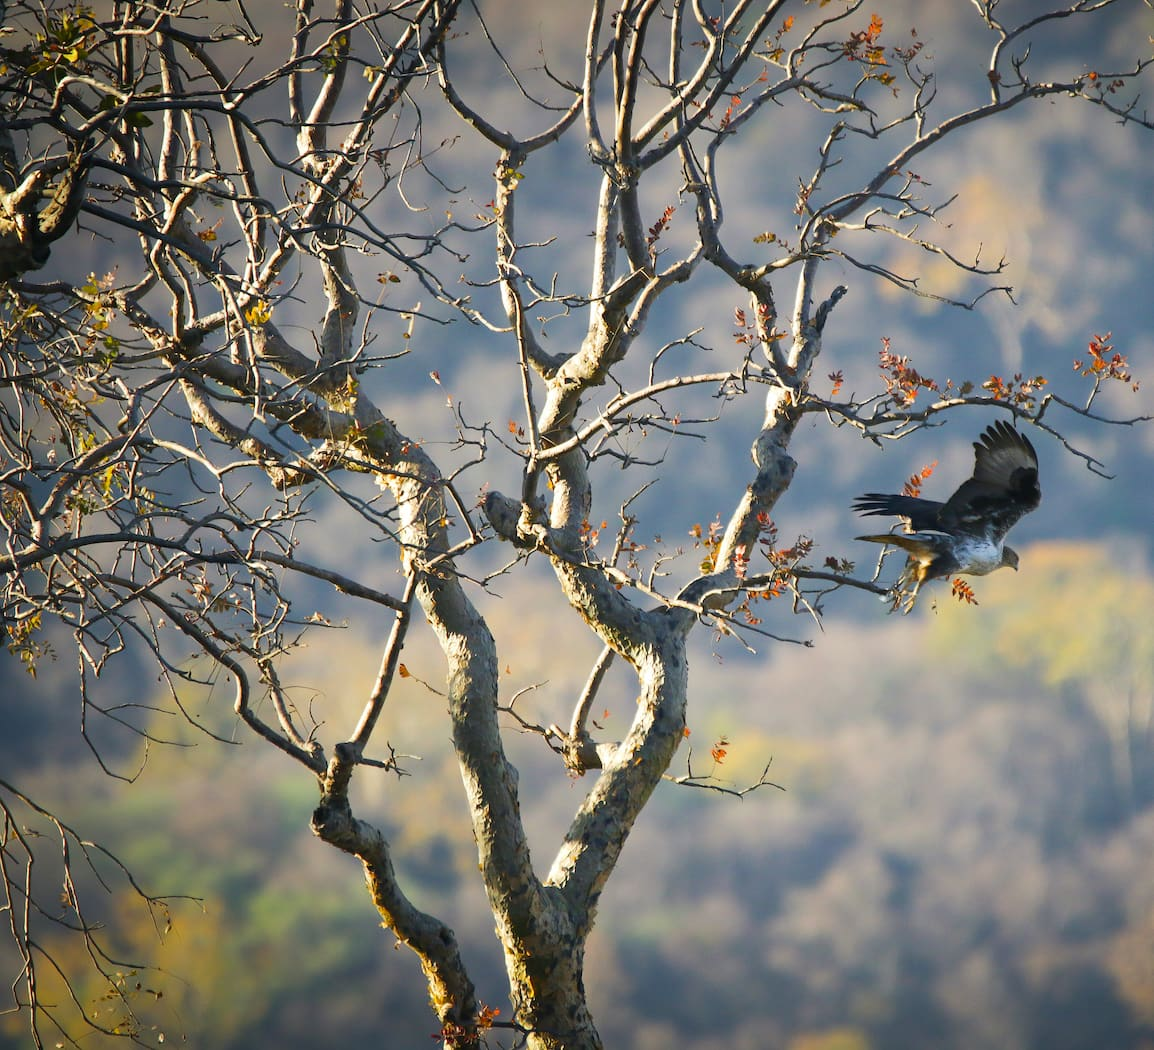 Avian Windfall at Todgarh-Raoli and Kumbalgarh